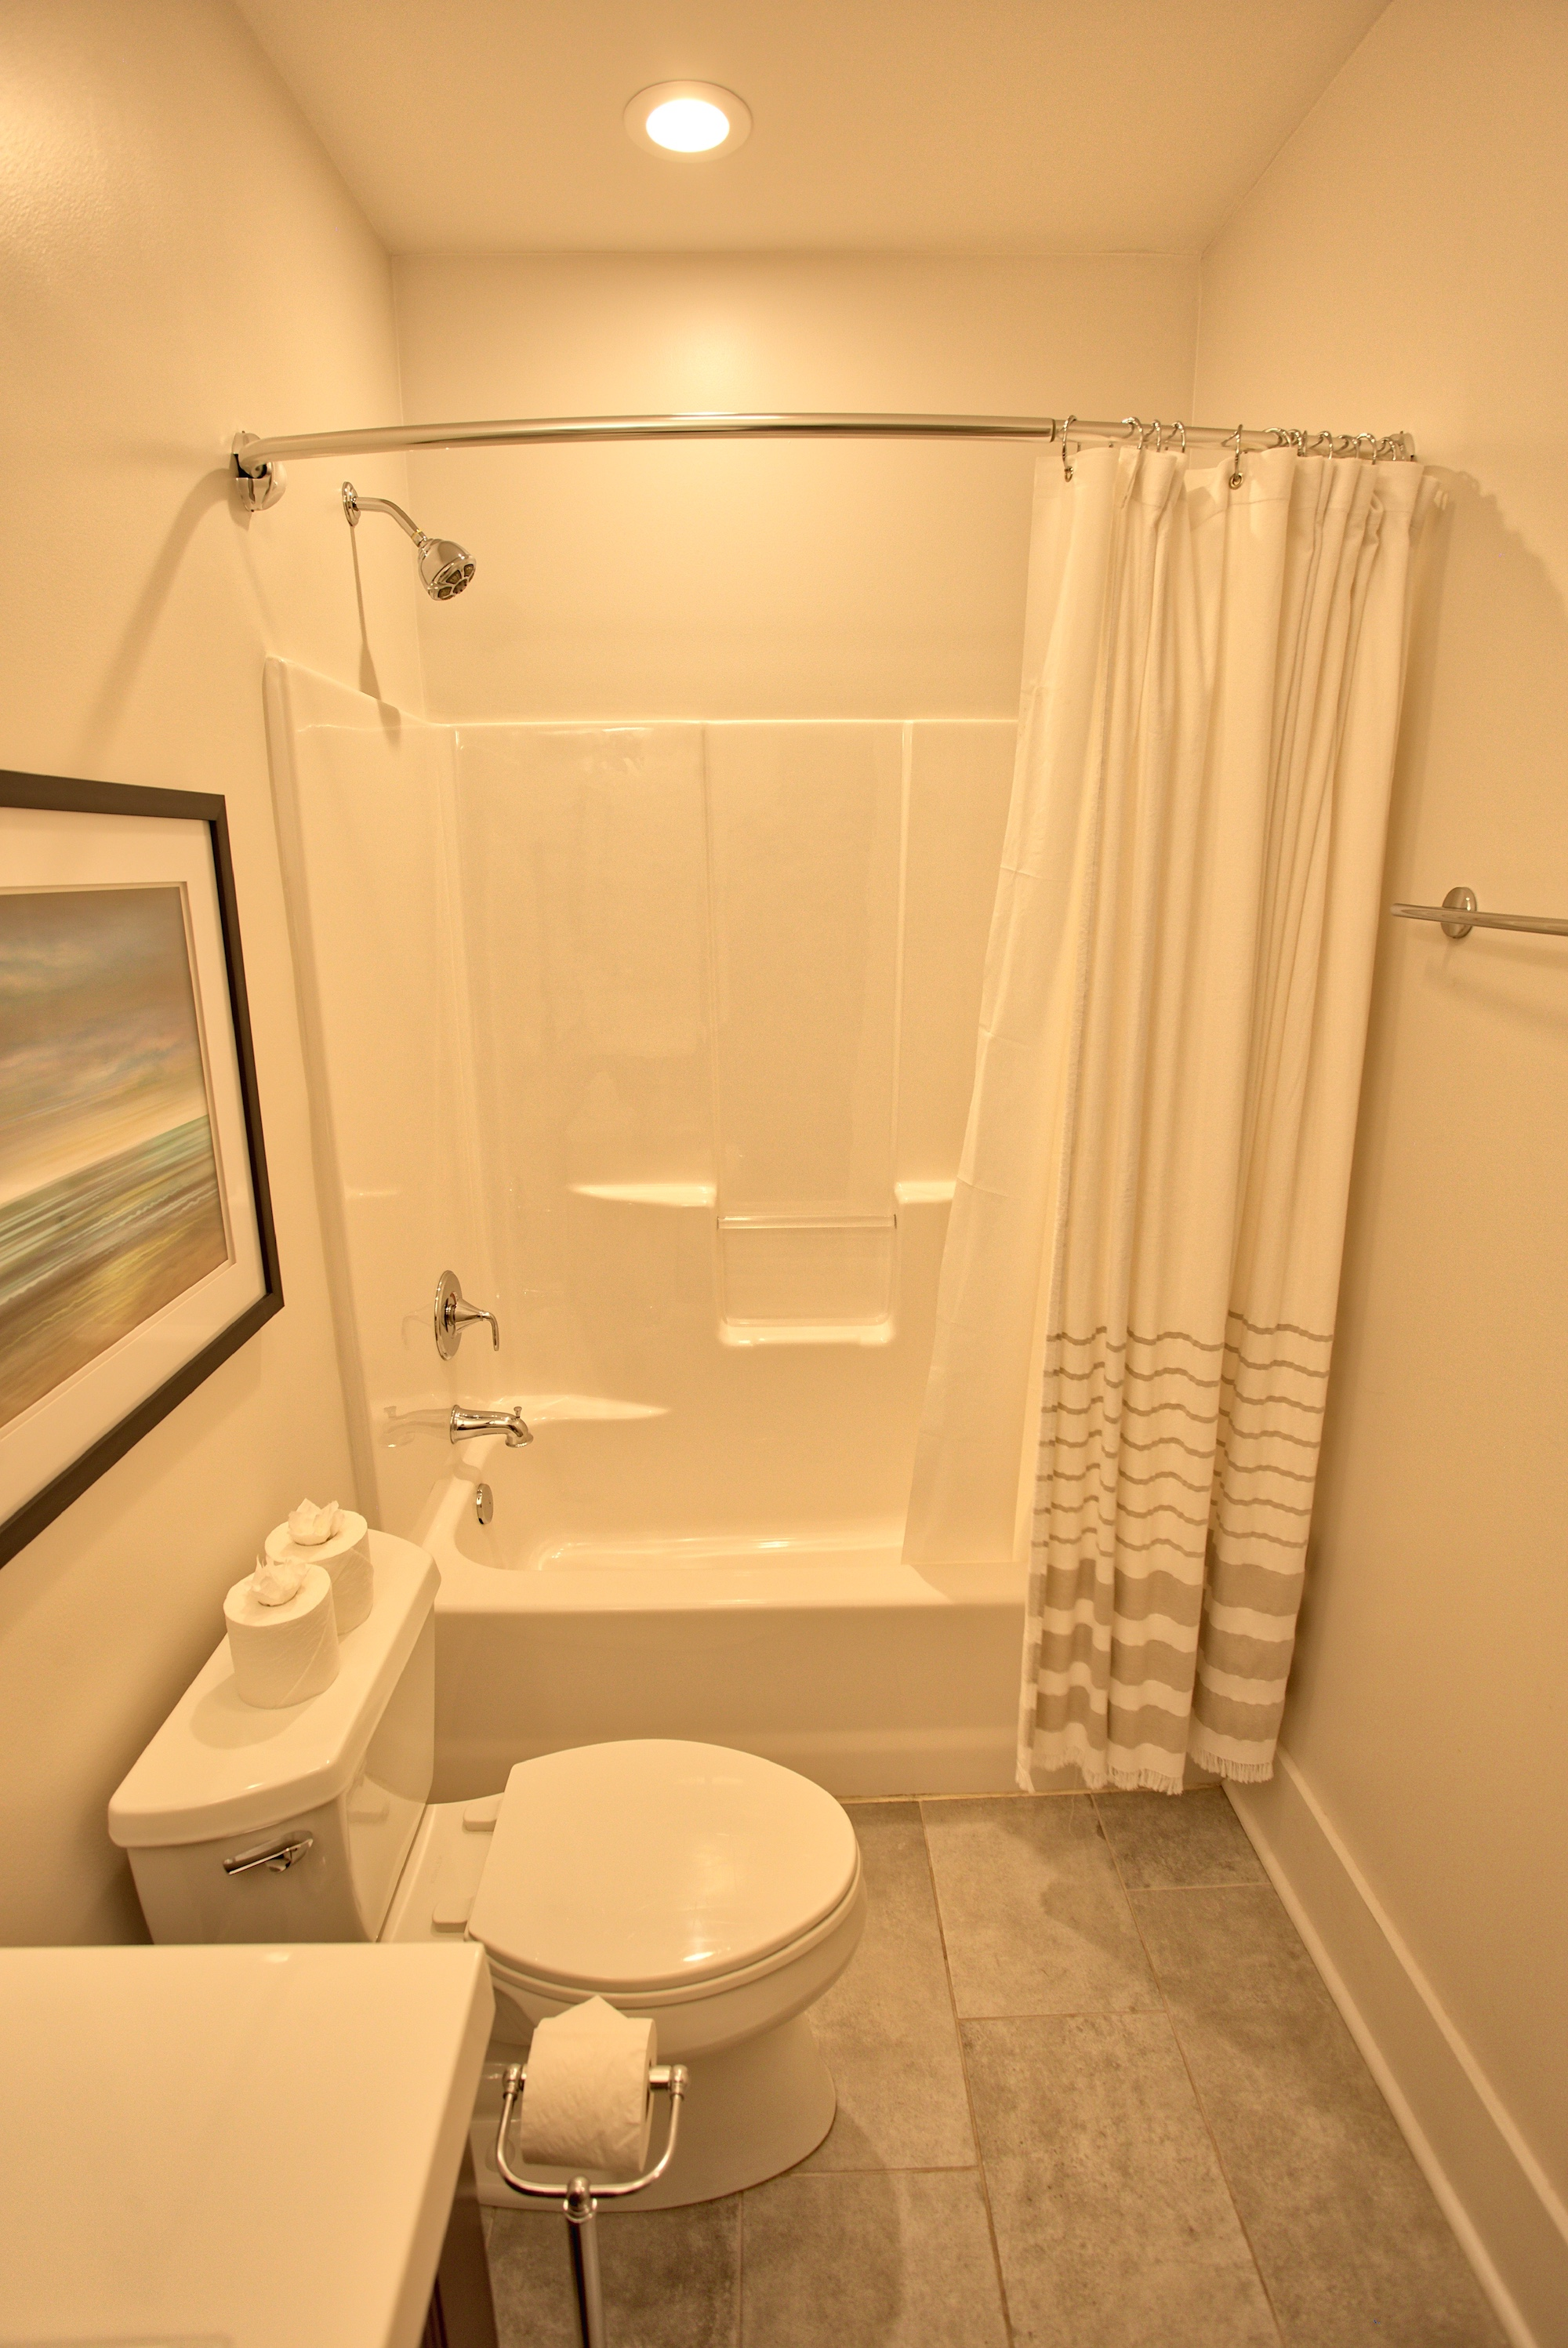 Suite on King Street Charleston SC Vacation Rental The Gullah Suite11.jpeg